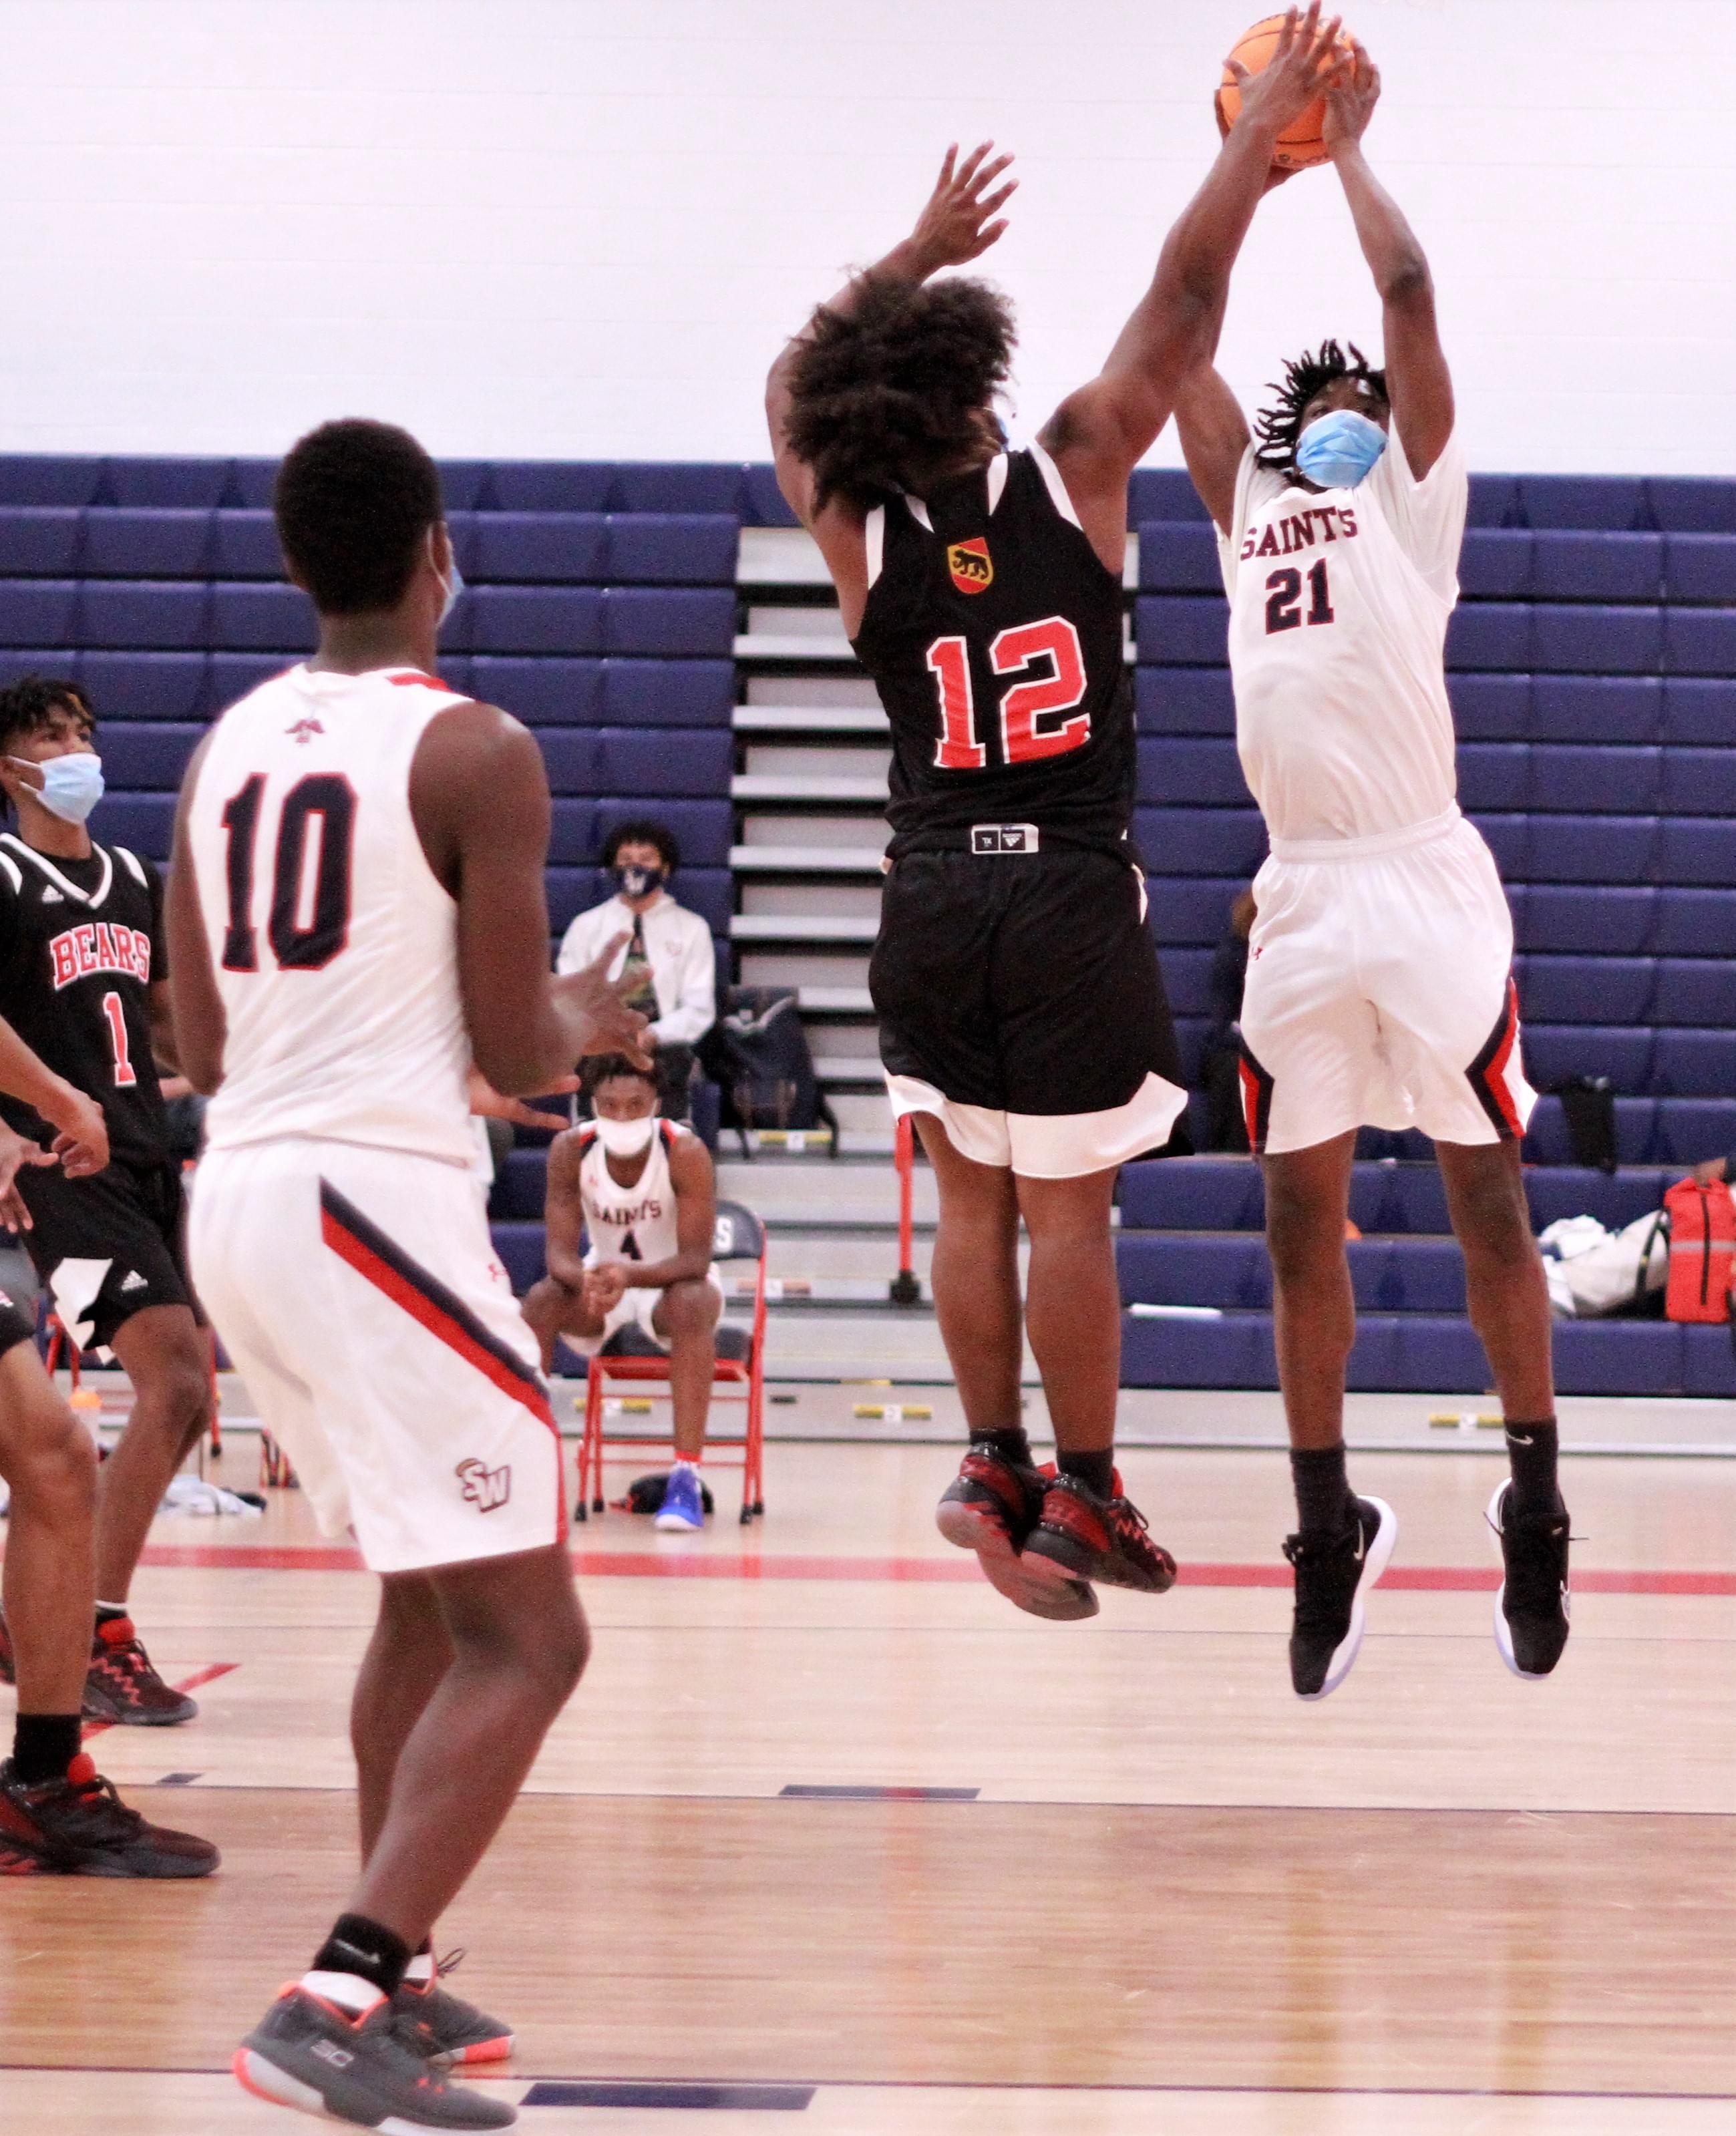 Boys Basketball: New Bern At Southern Wayne (PHOTO GALLERY)